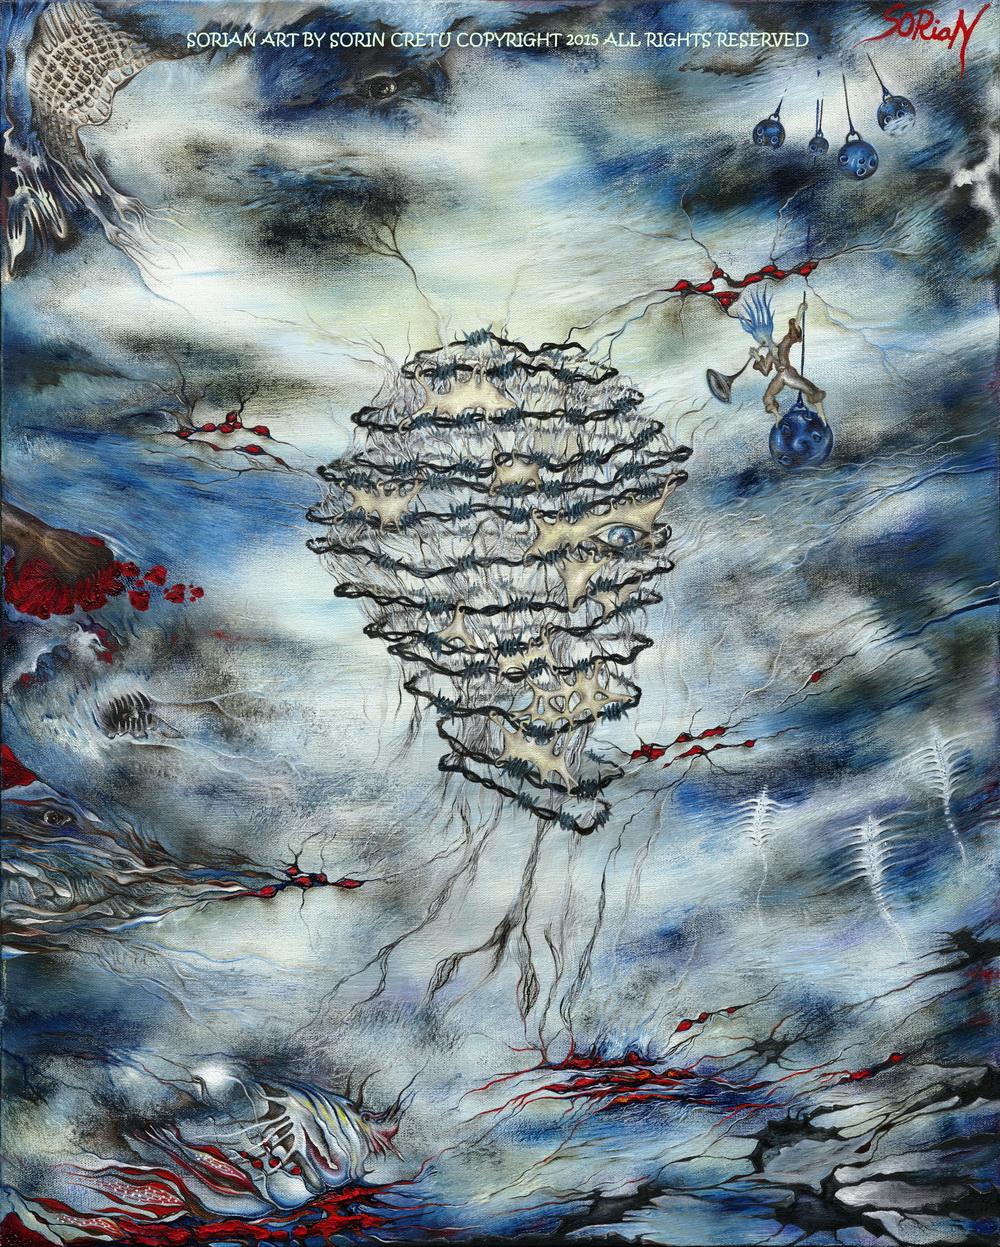 Dawn of Ego - SORiaN (Sorin Cretu) - 2015 - Size 30x24inch - very small.jpg